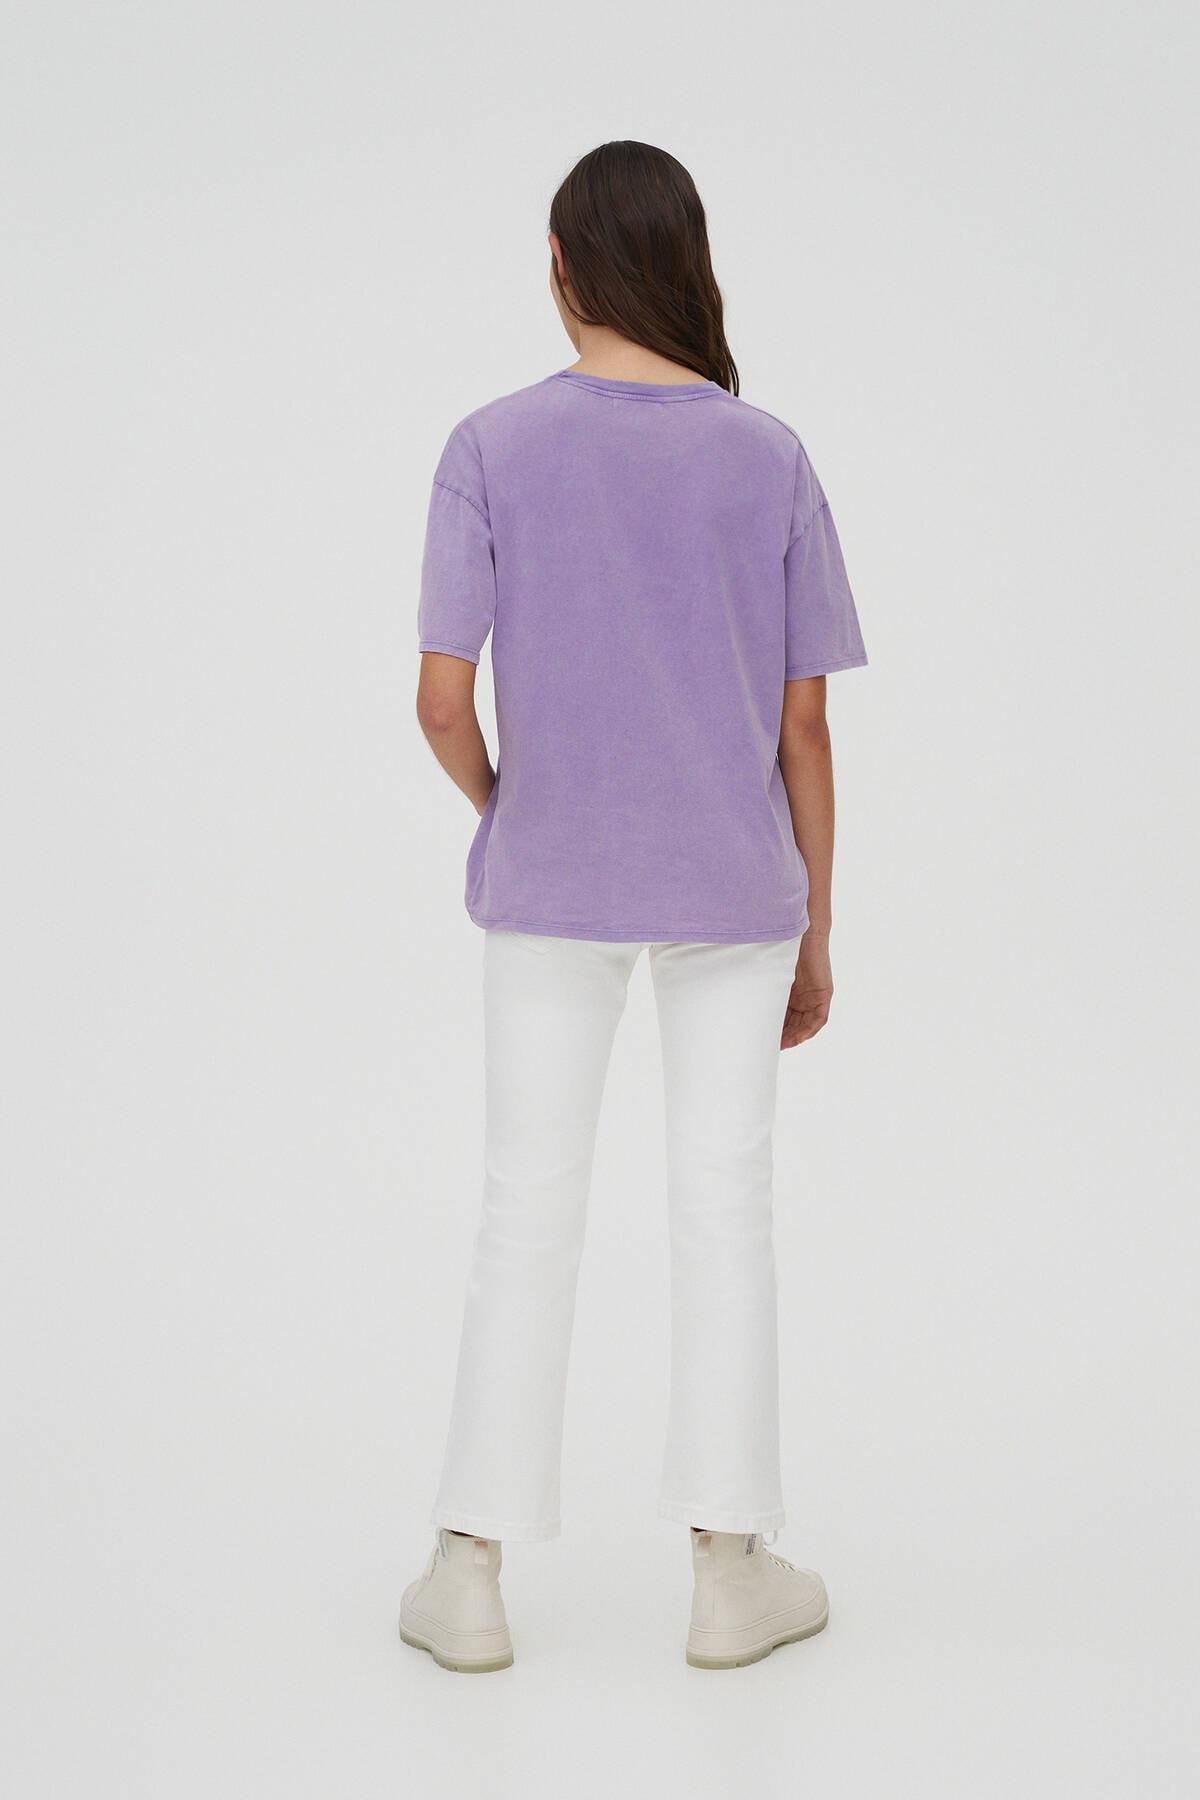 Pull & Bear Kadın Mor Lisa Simpson Görselli T-Shirt 04240372 2